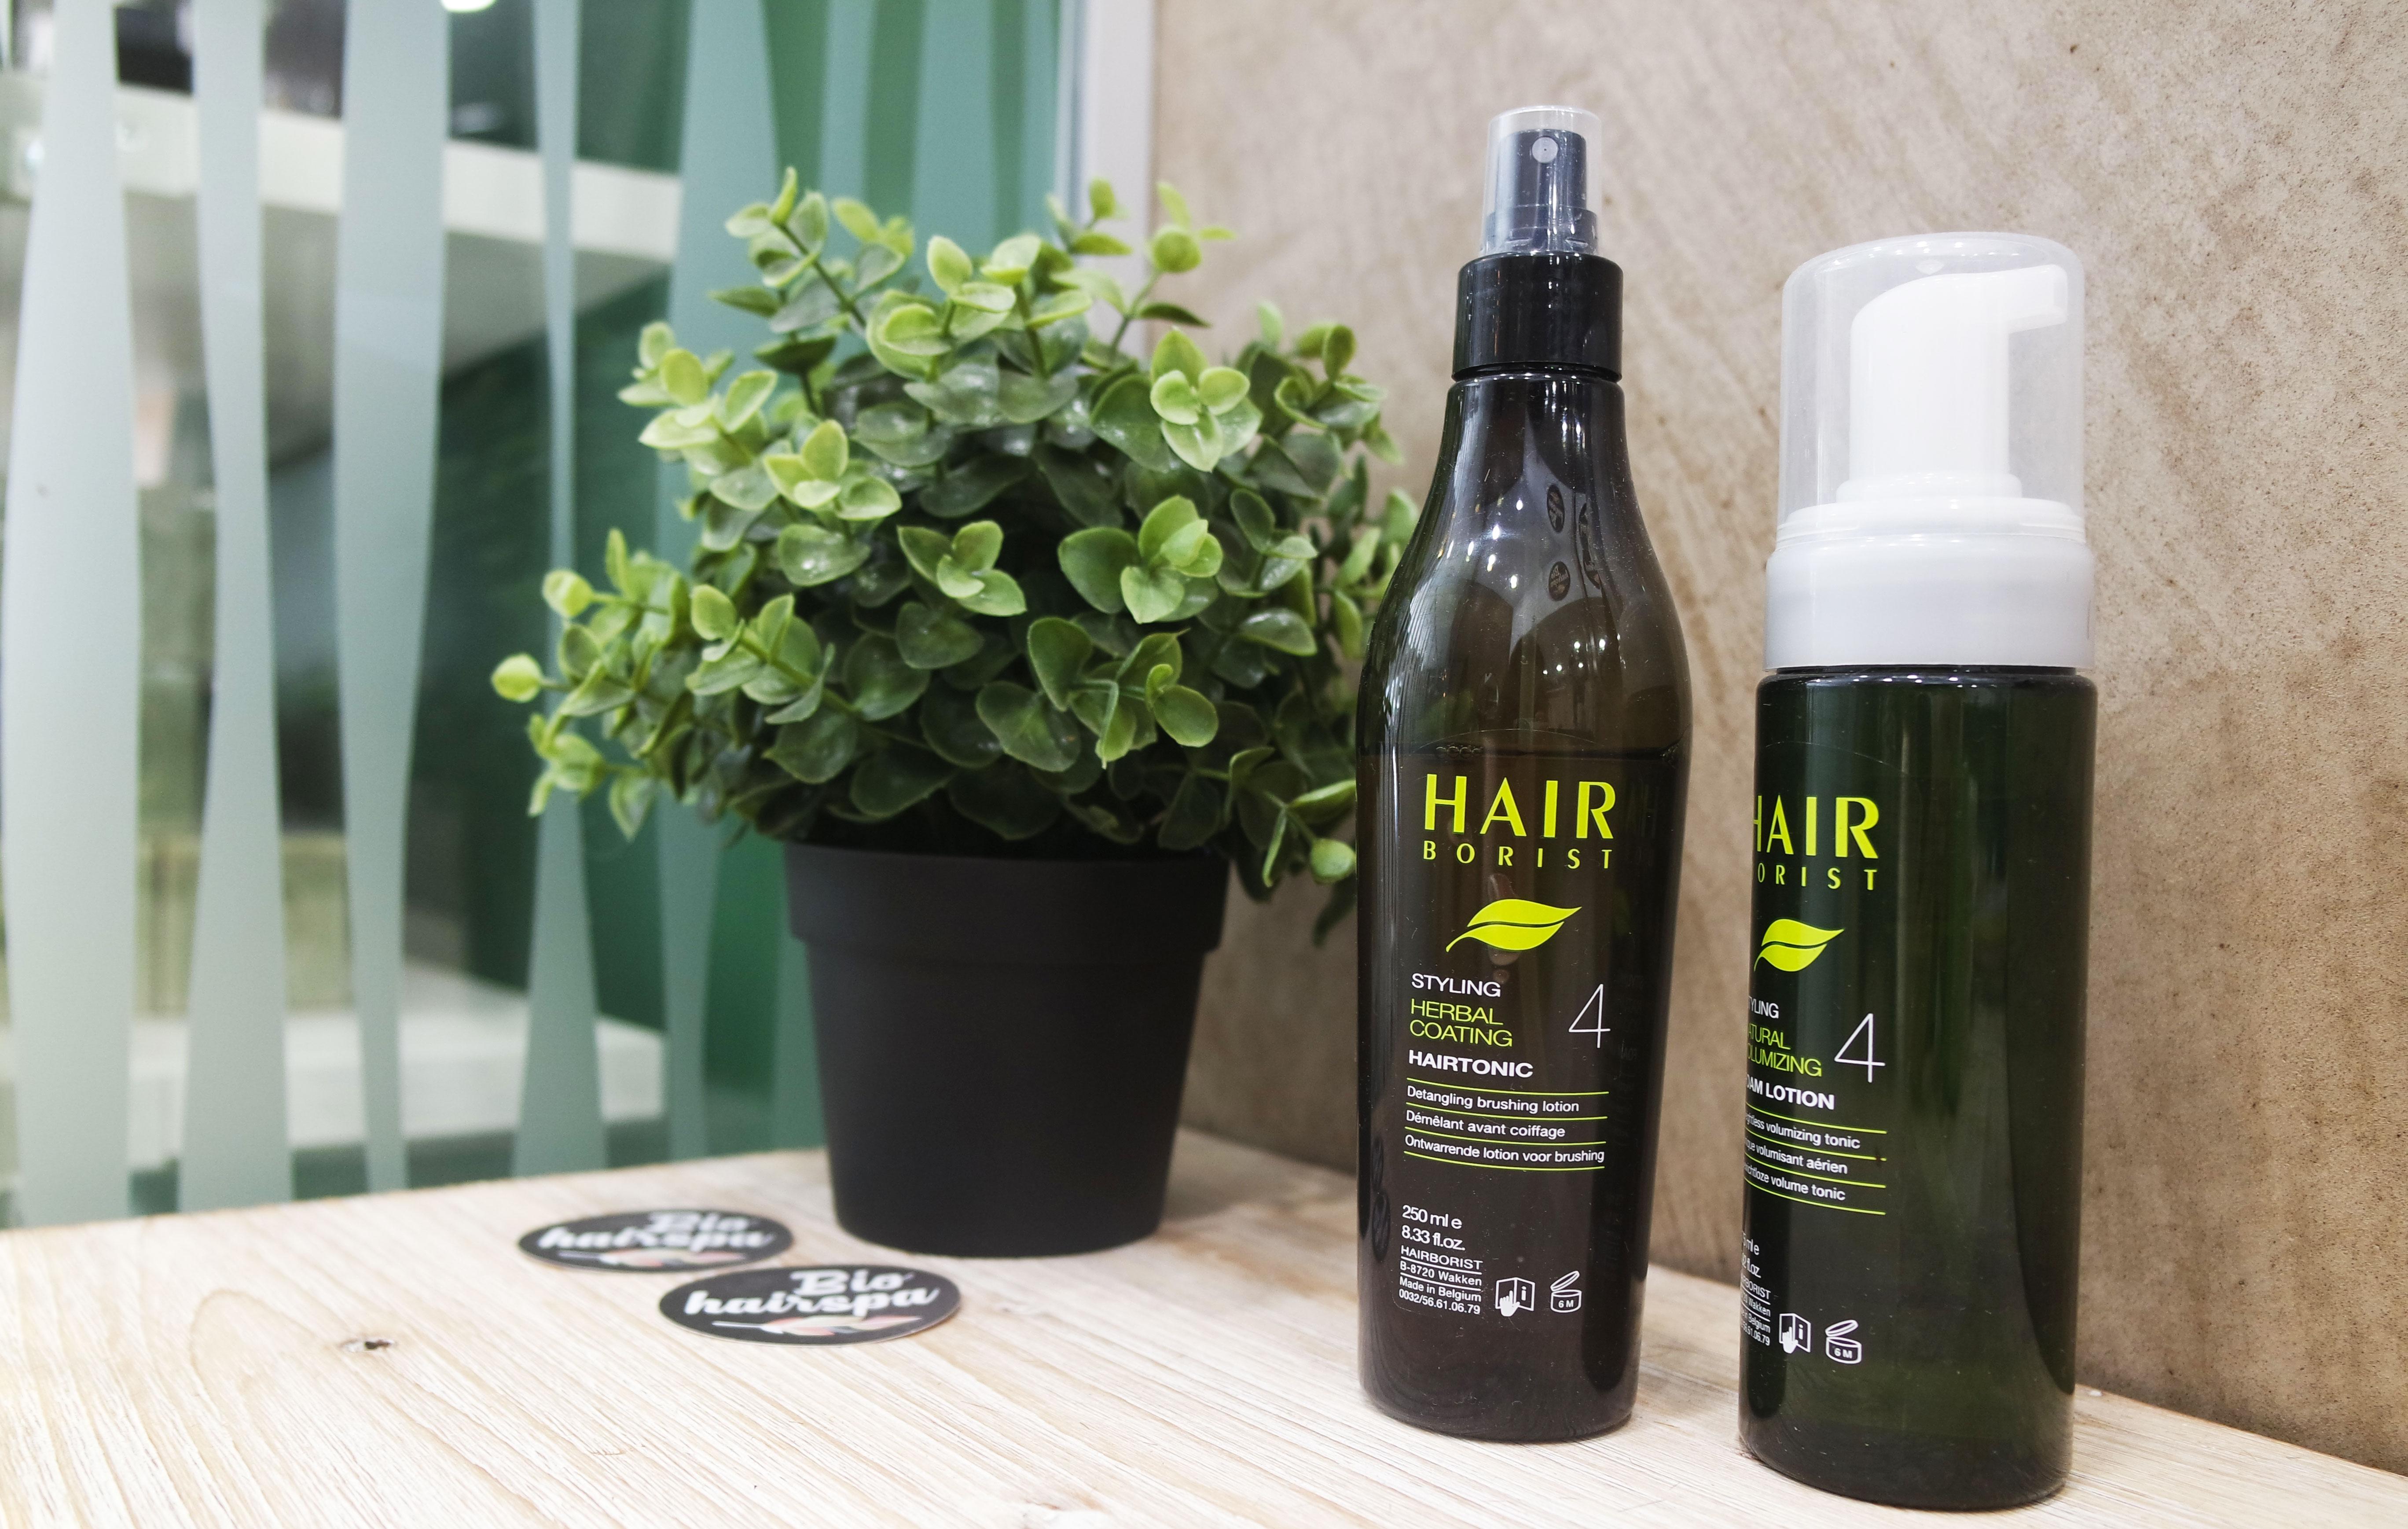 gokan-coiffeur-bio-bruxelles-soin-avis-blog-hairborist